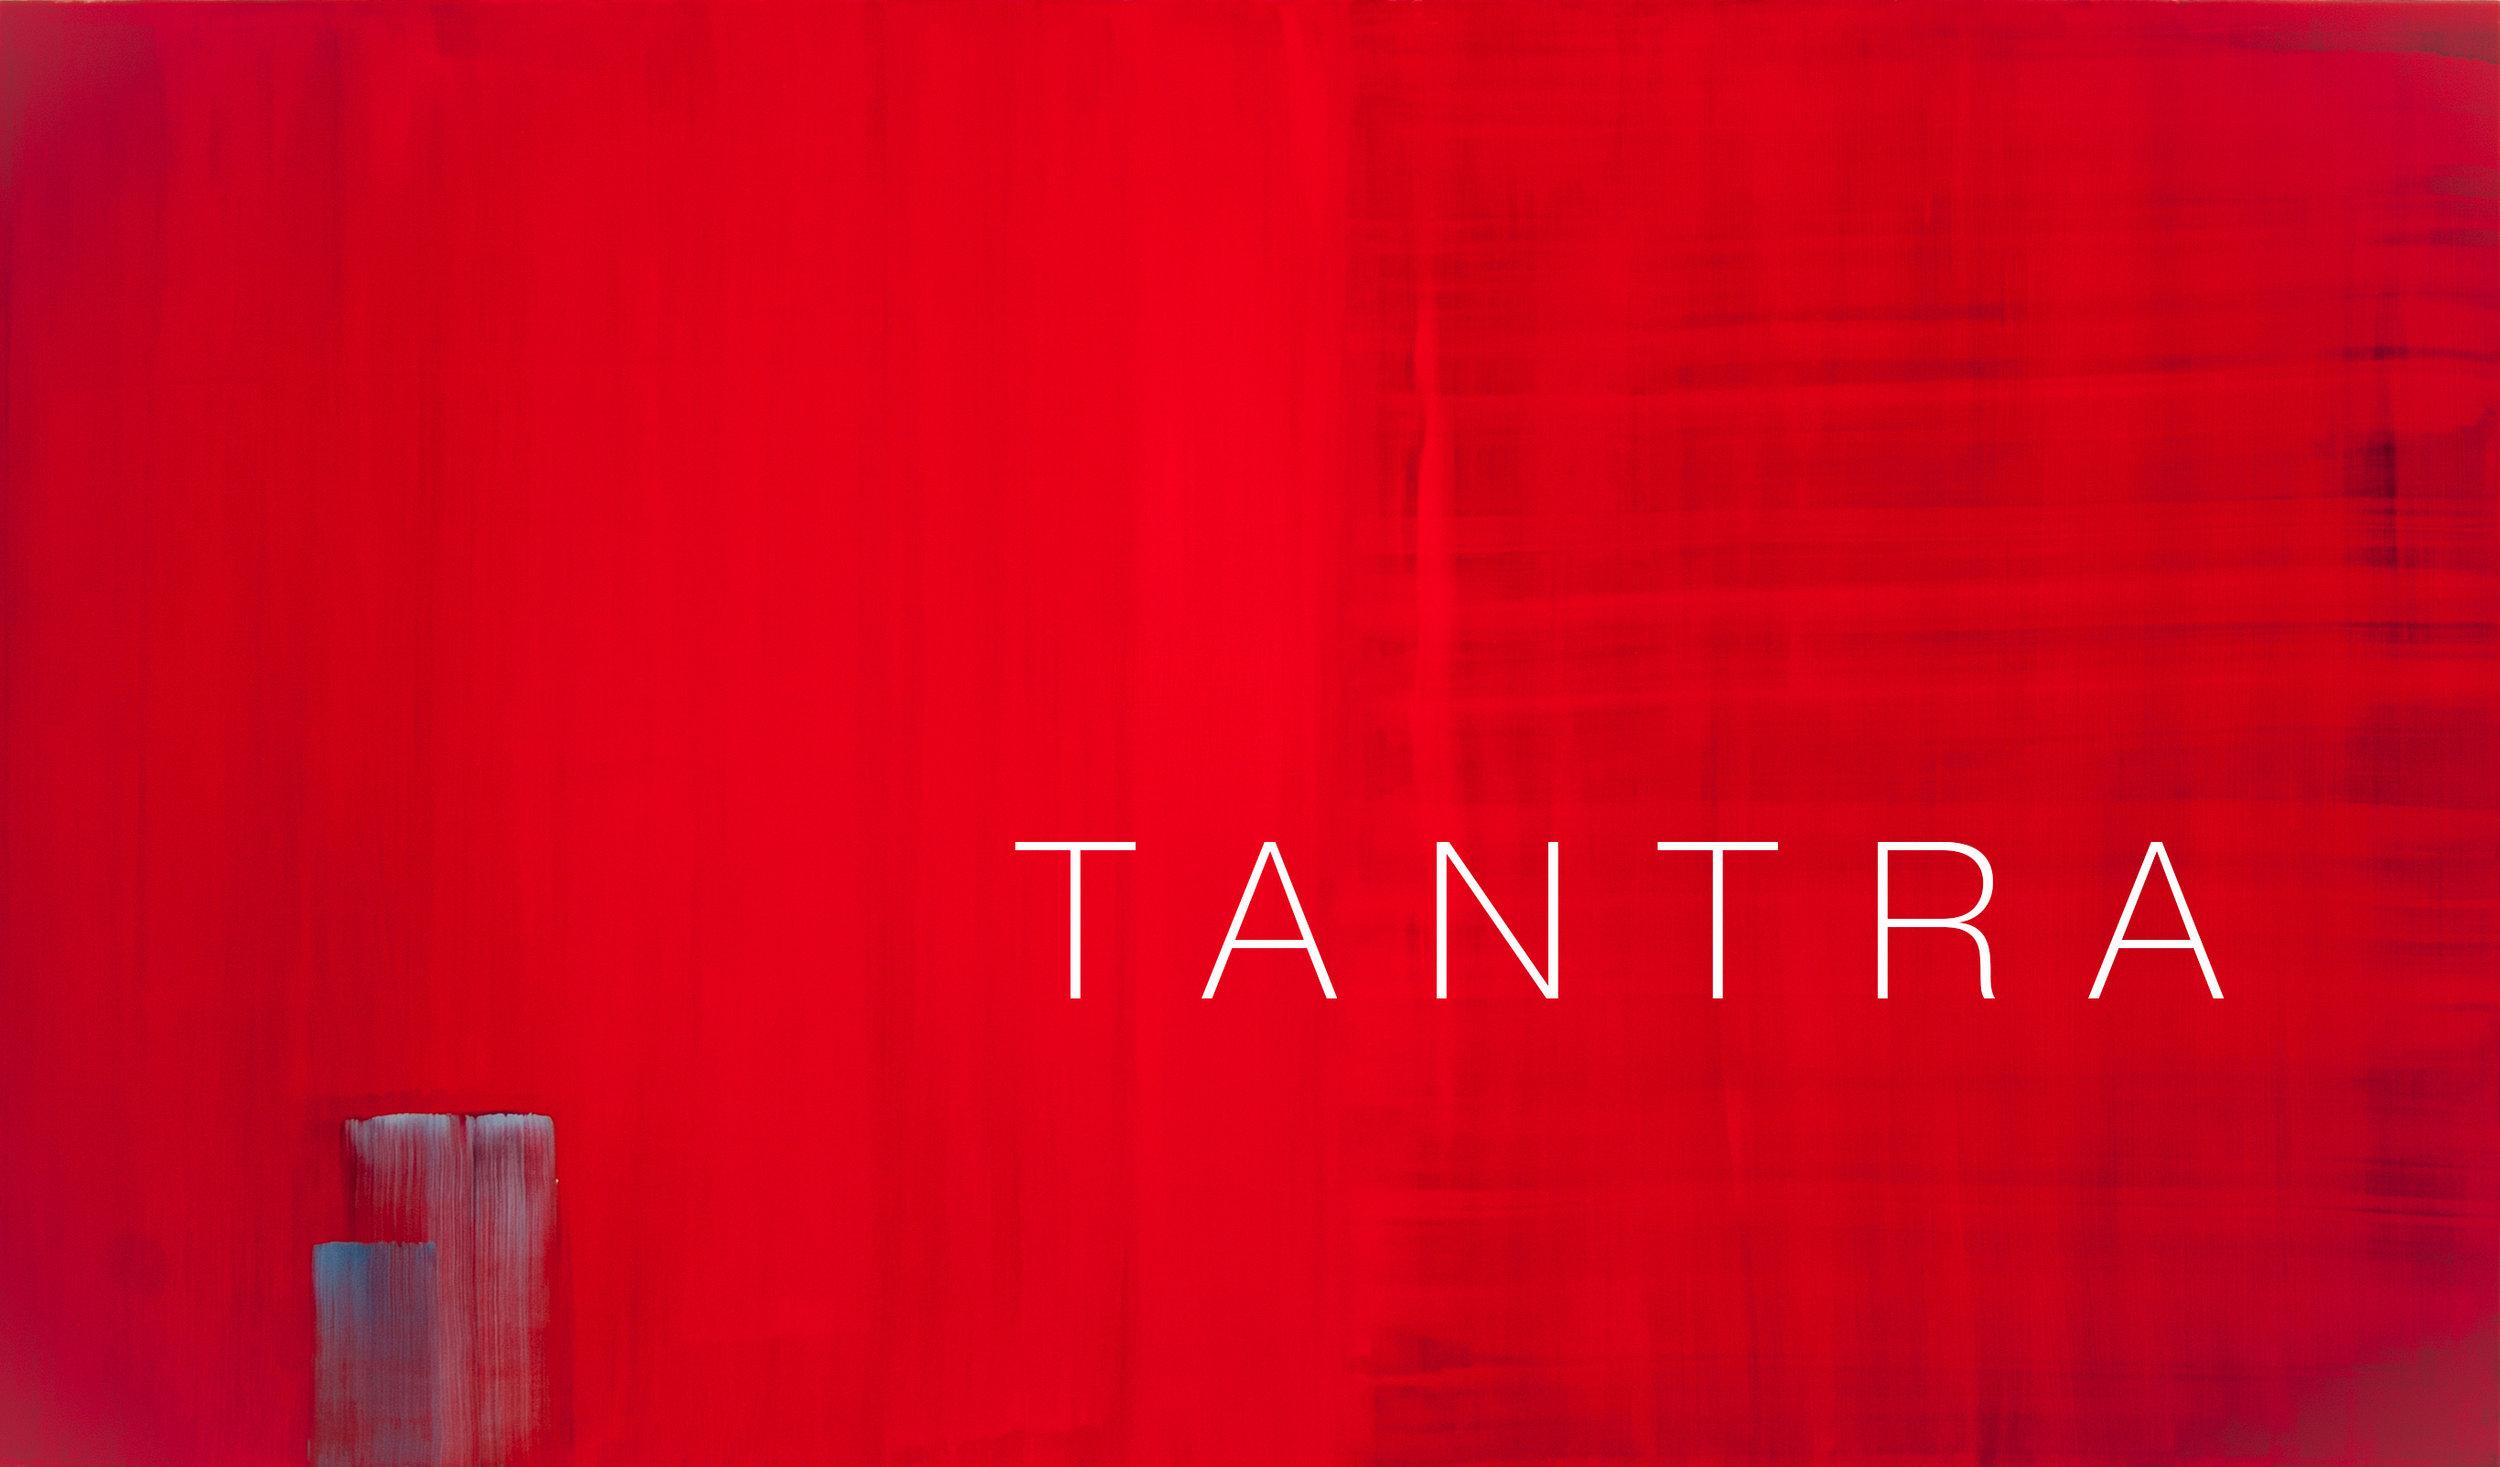 TANTRA_headline.jpg